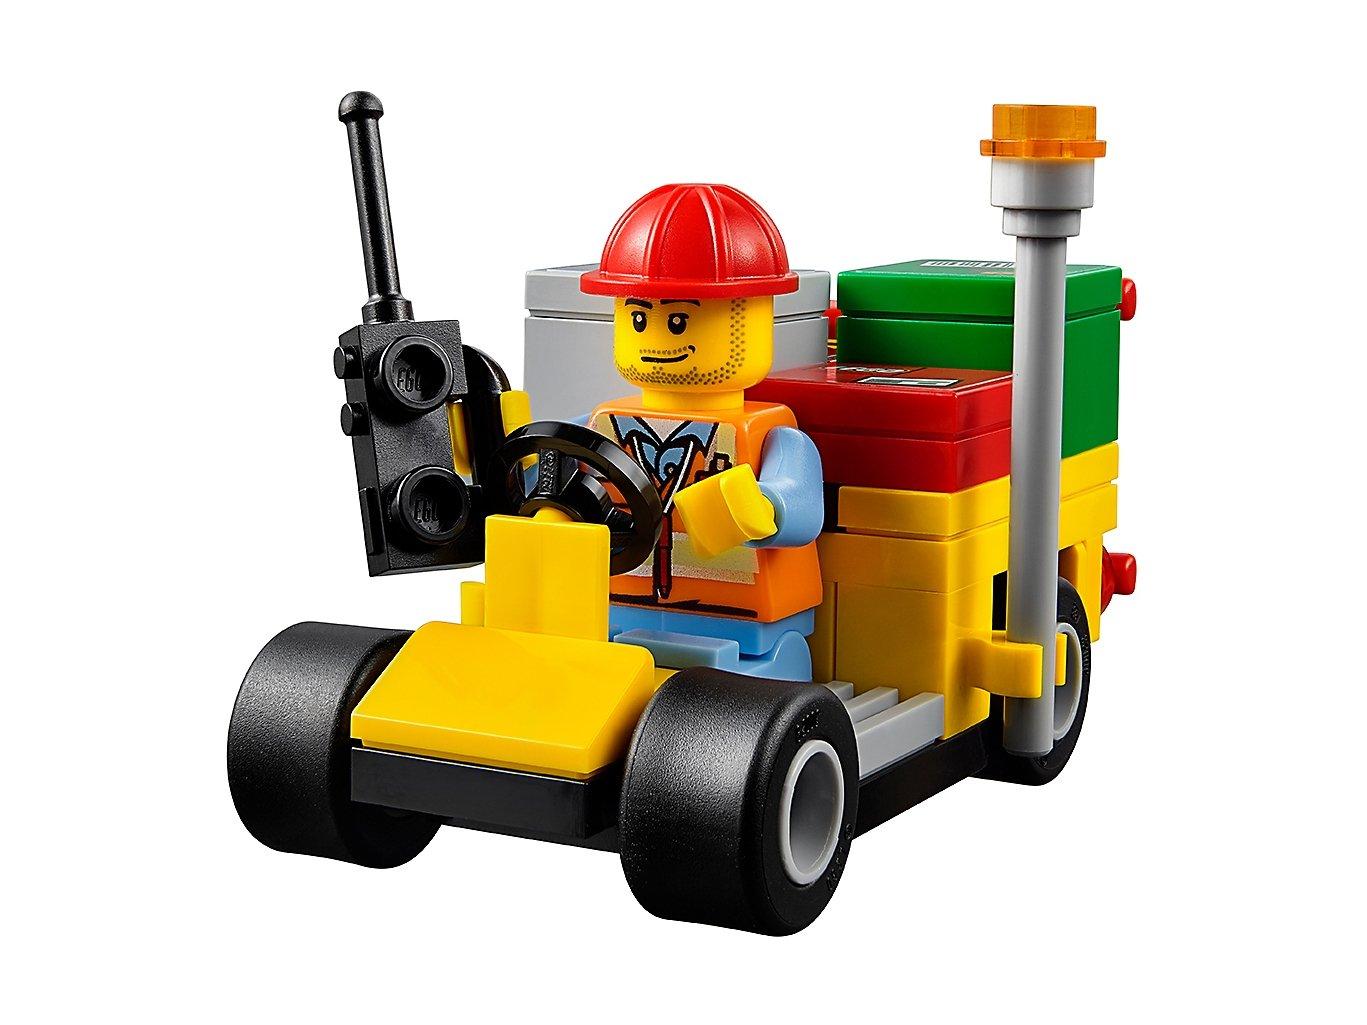 LEGO City 60101 Samolot transportowy